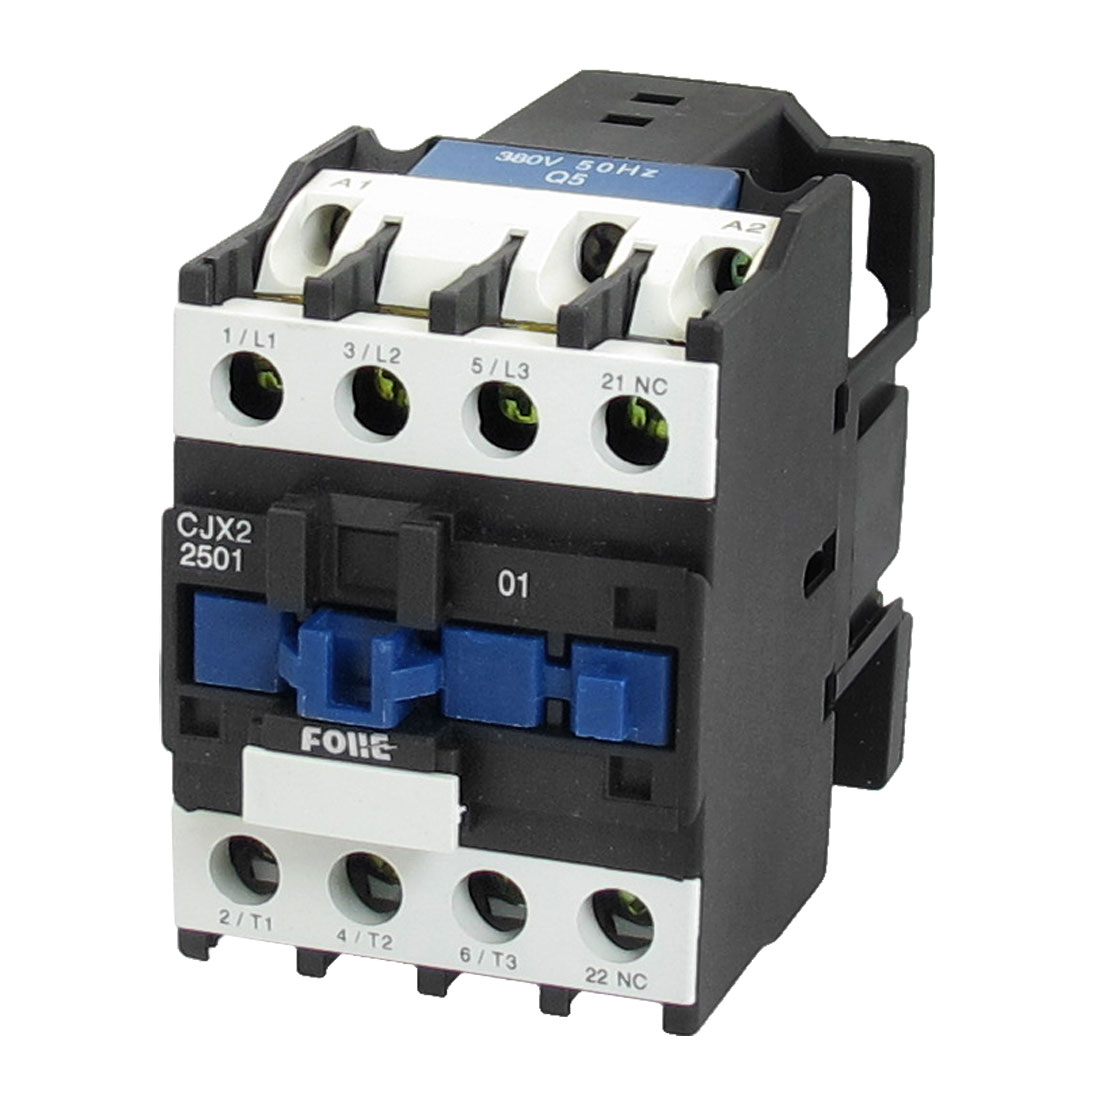 380V Coil Motor Controler AC Contactor 3 Pole 3P NC 660V 15KW CJX2-2501